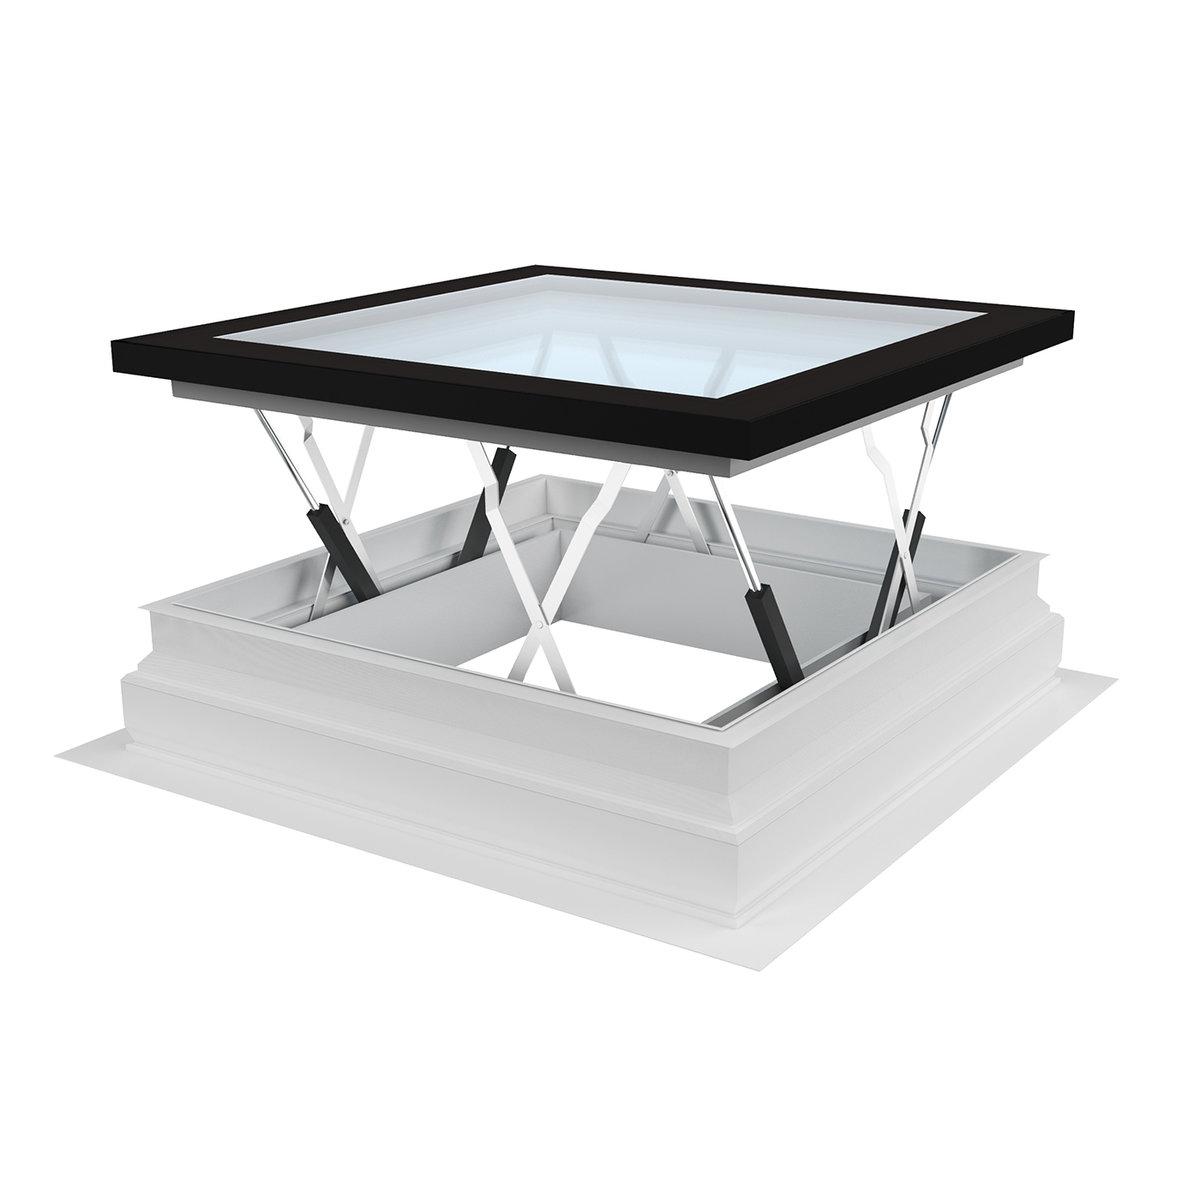 fakro fen tre toit plat dsf eurabo. Black Bedroom Furniture Sets. Home Design Ideas